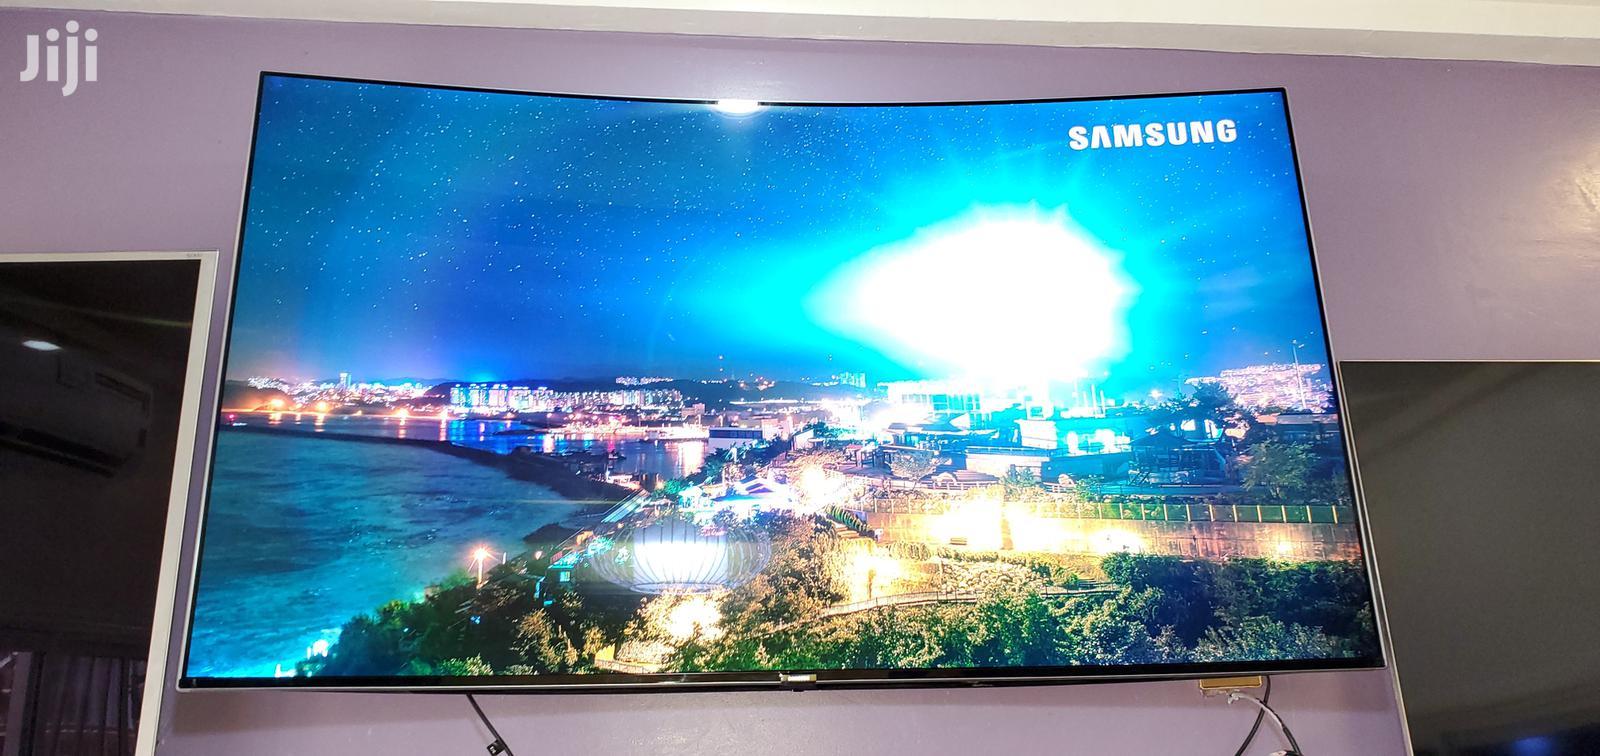 "65"" Samsung Curved Smart Suhd Hdr Ultra 4K TV Ue65ks9000   TV & DVD Equipment for sale in Ojo, Lagos State, Nigeria"